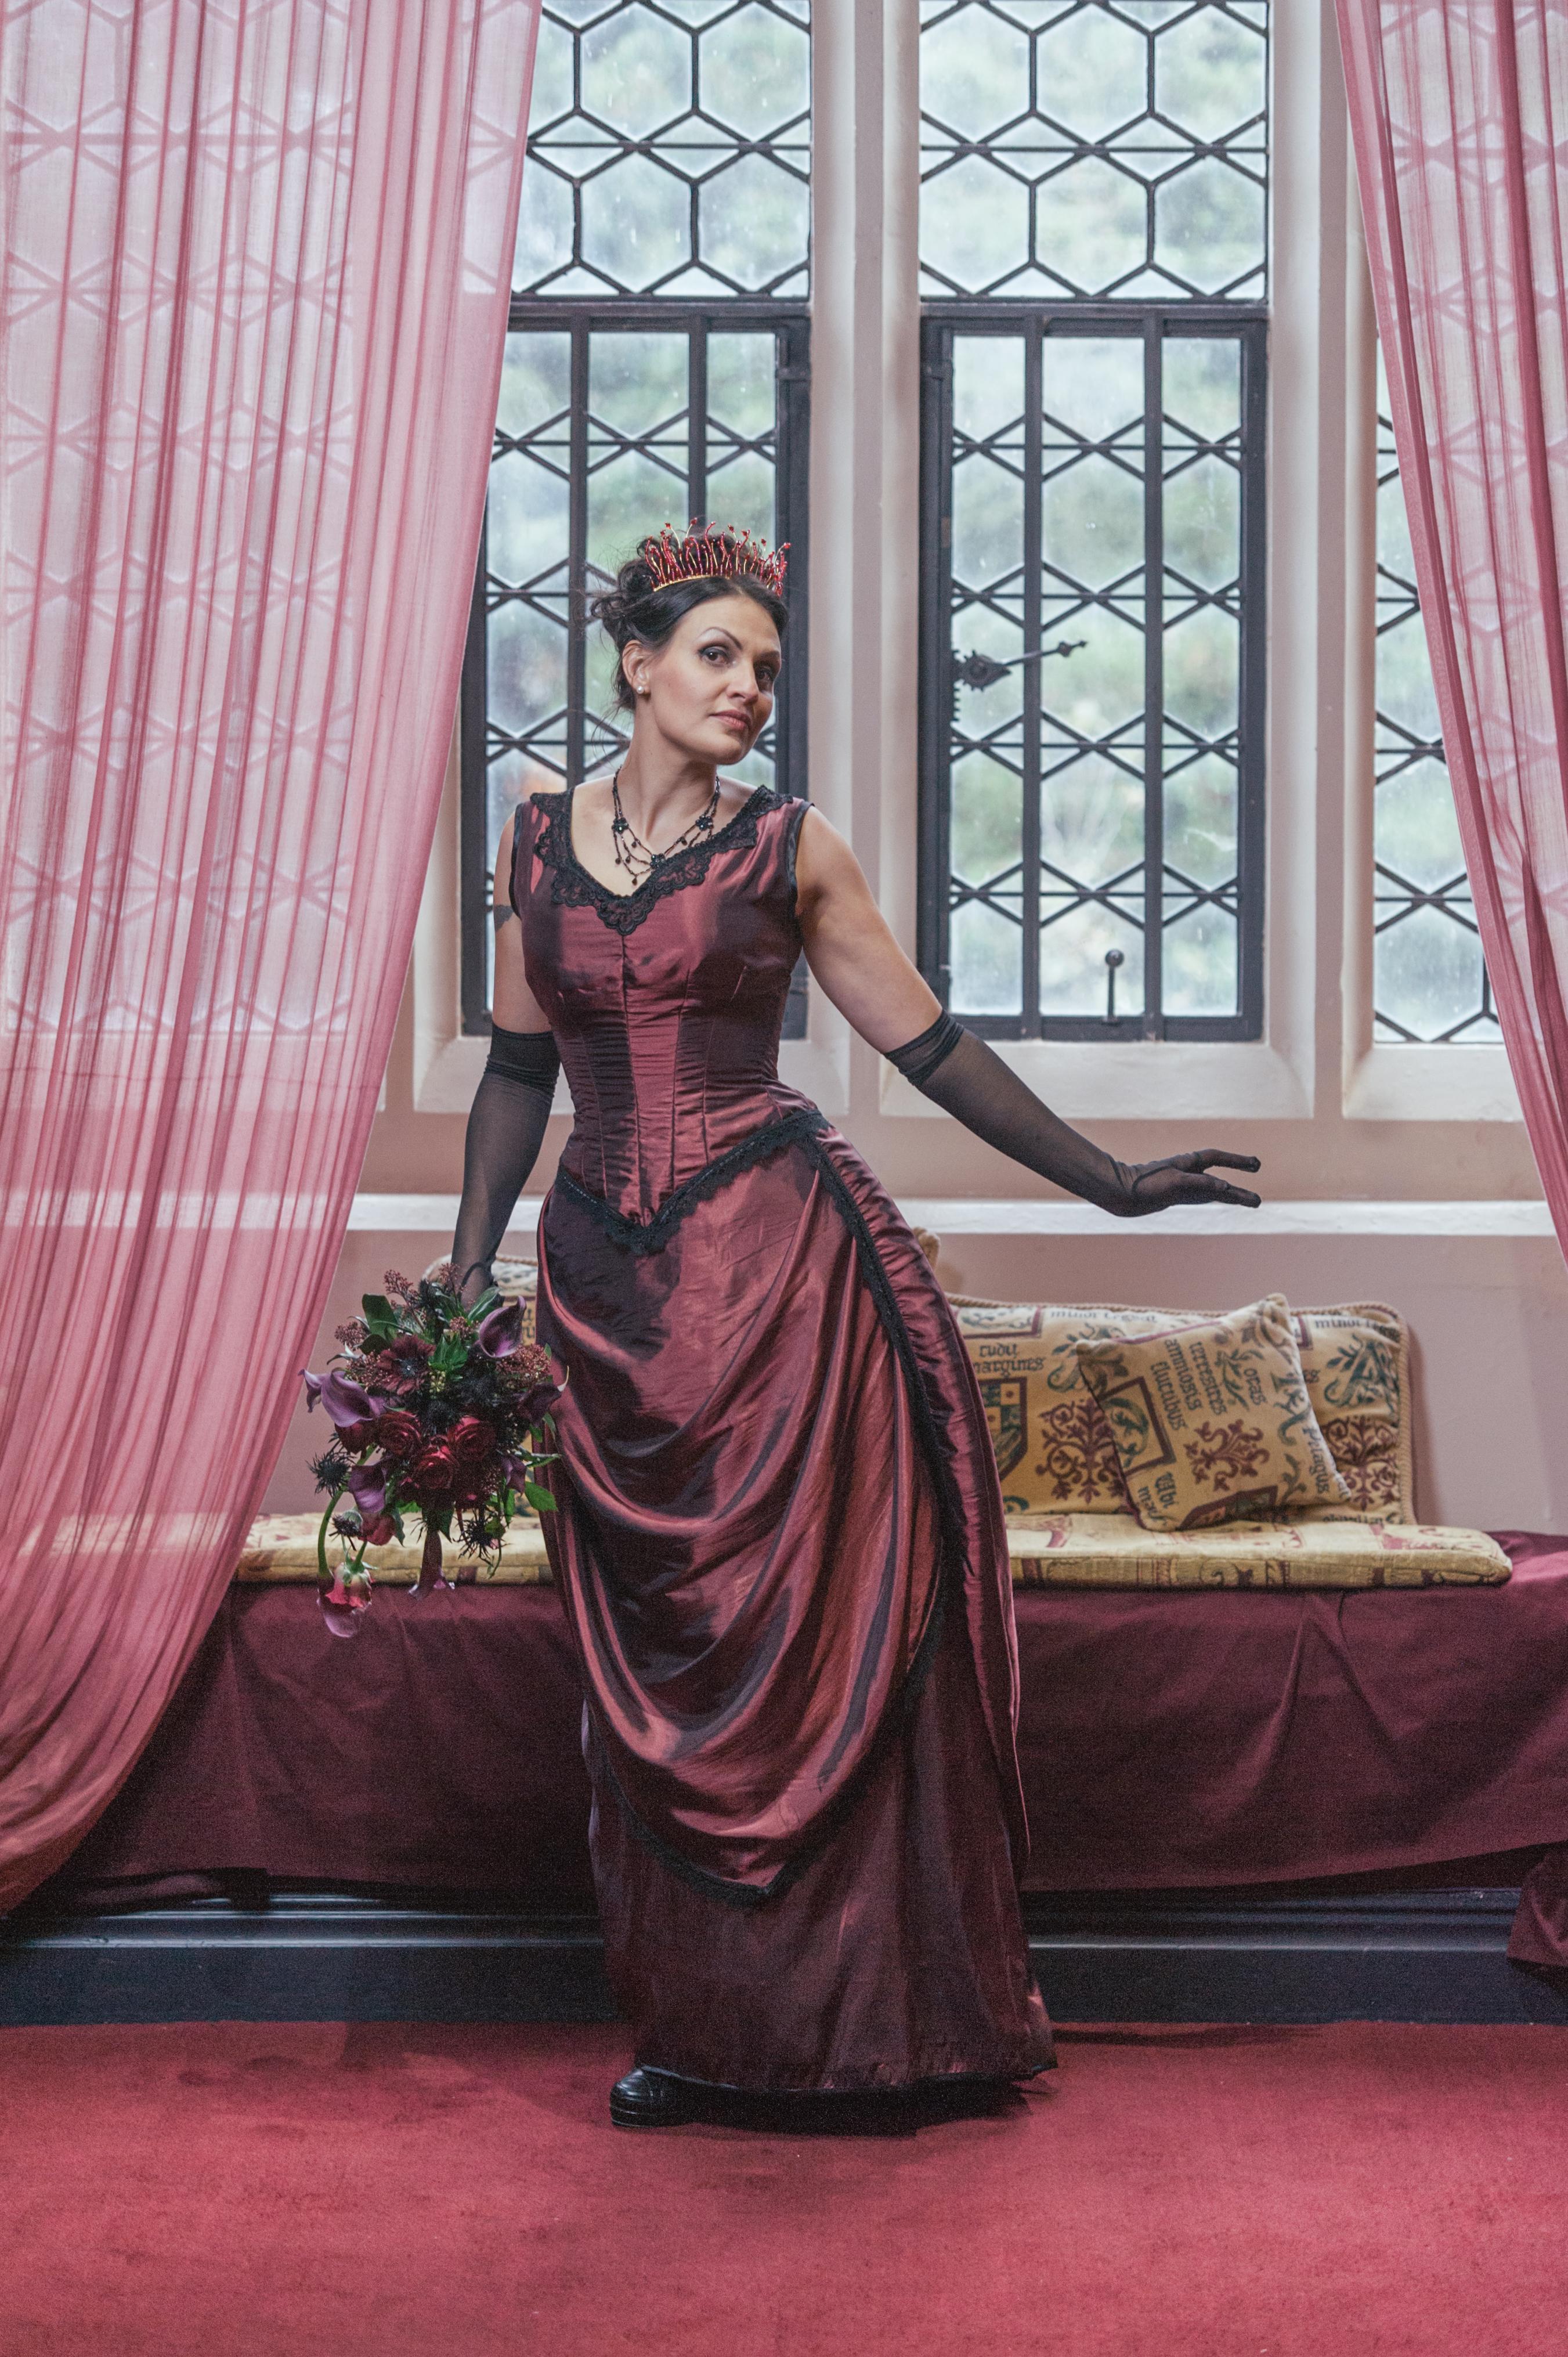 Gothic Bride by RoseAddict on DeviantArt